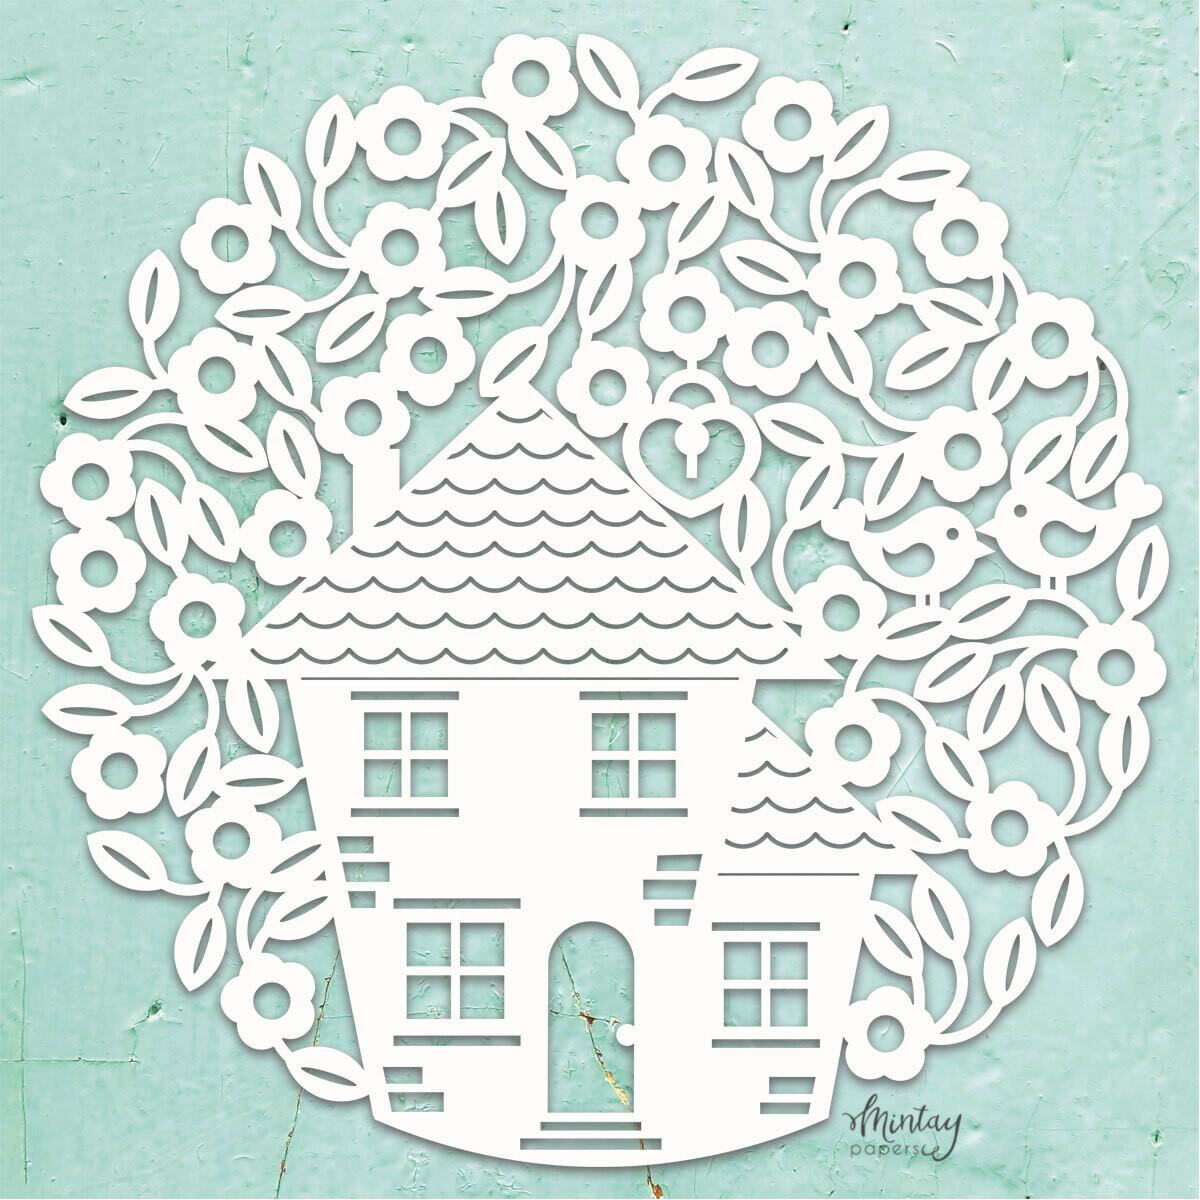 Tree House Chippies - Mintay by Karola